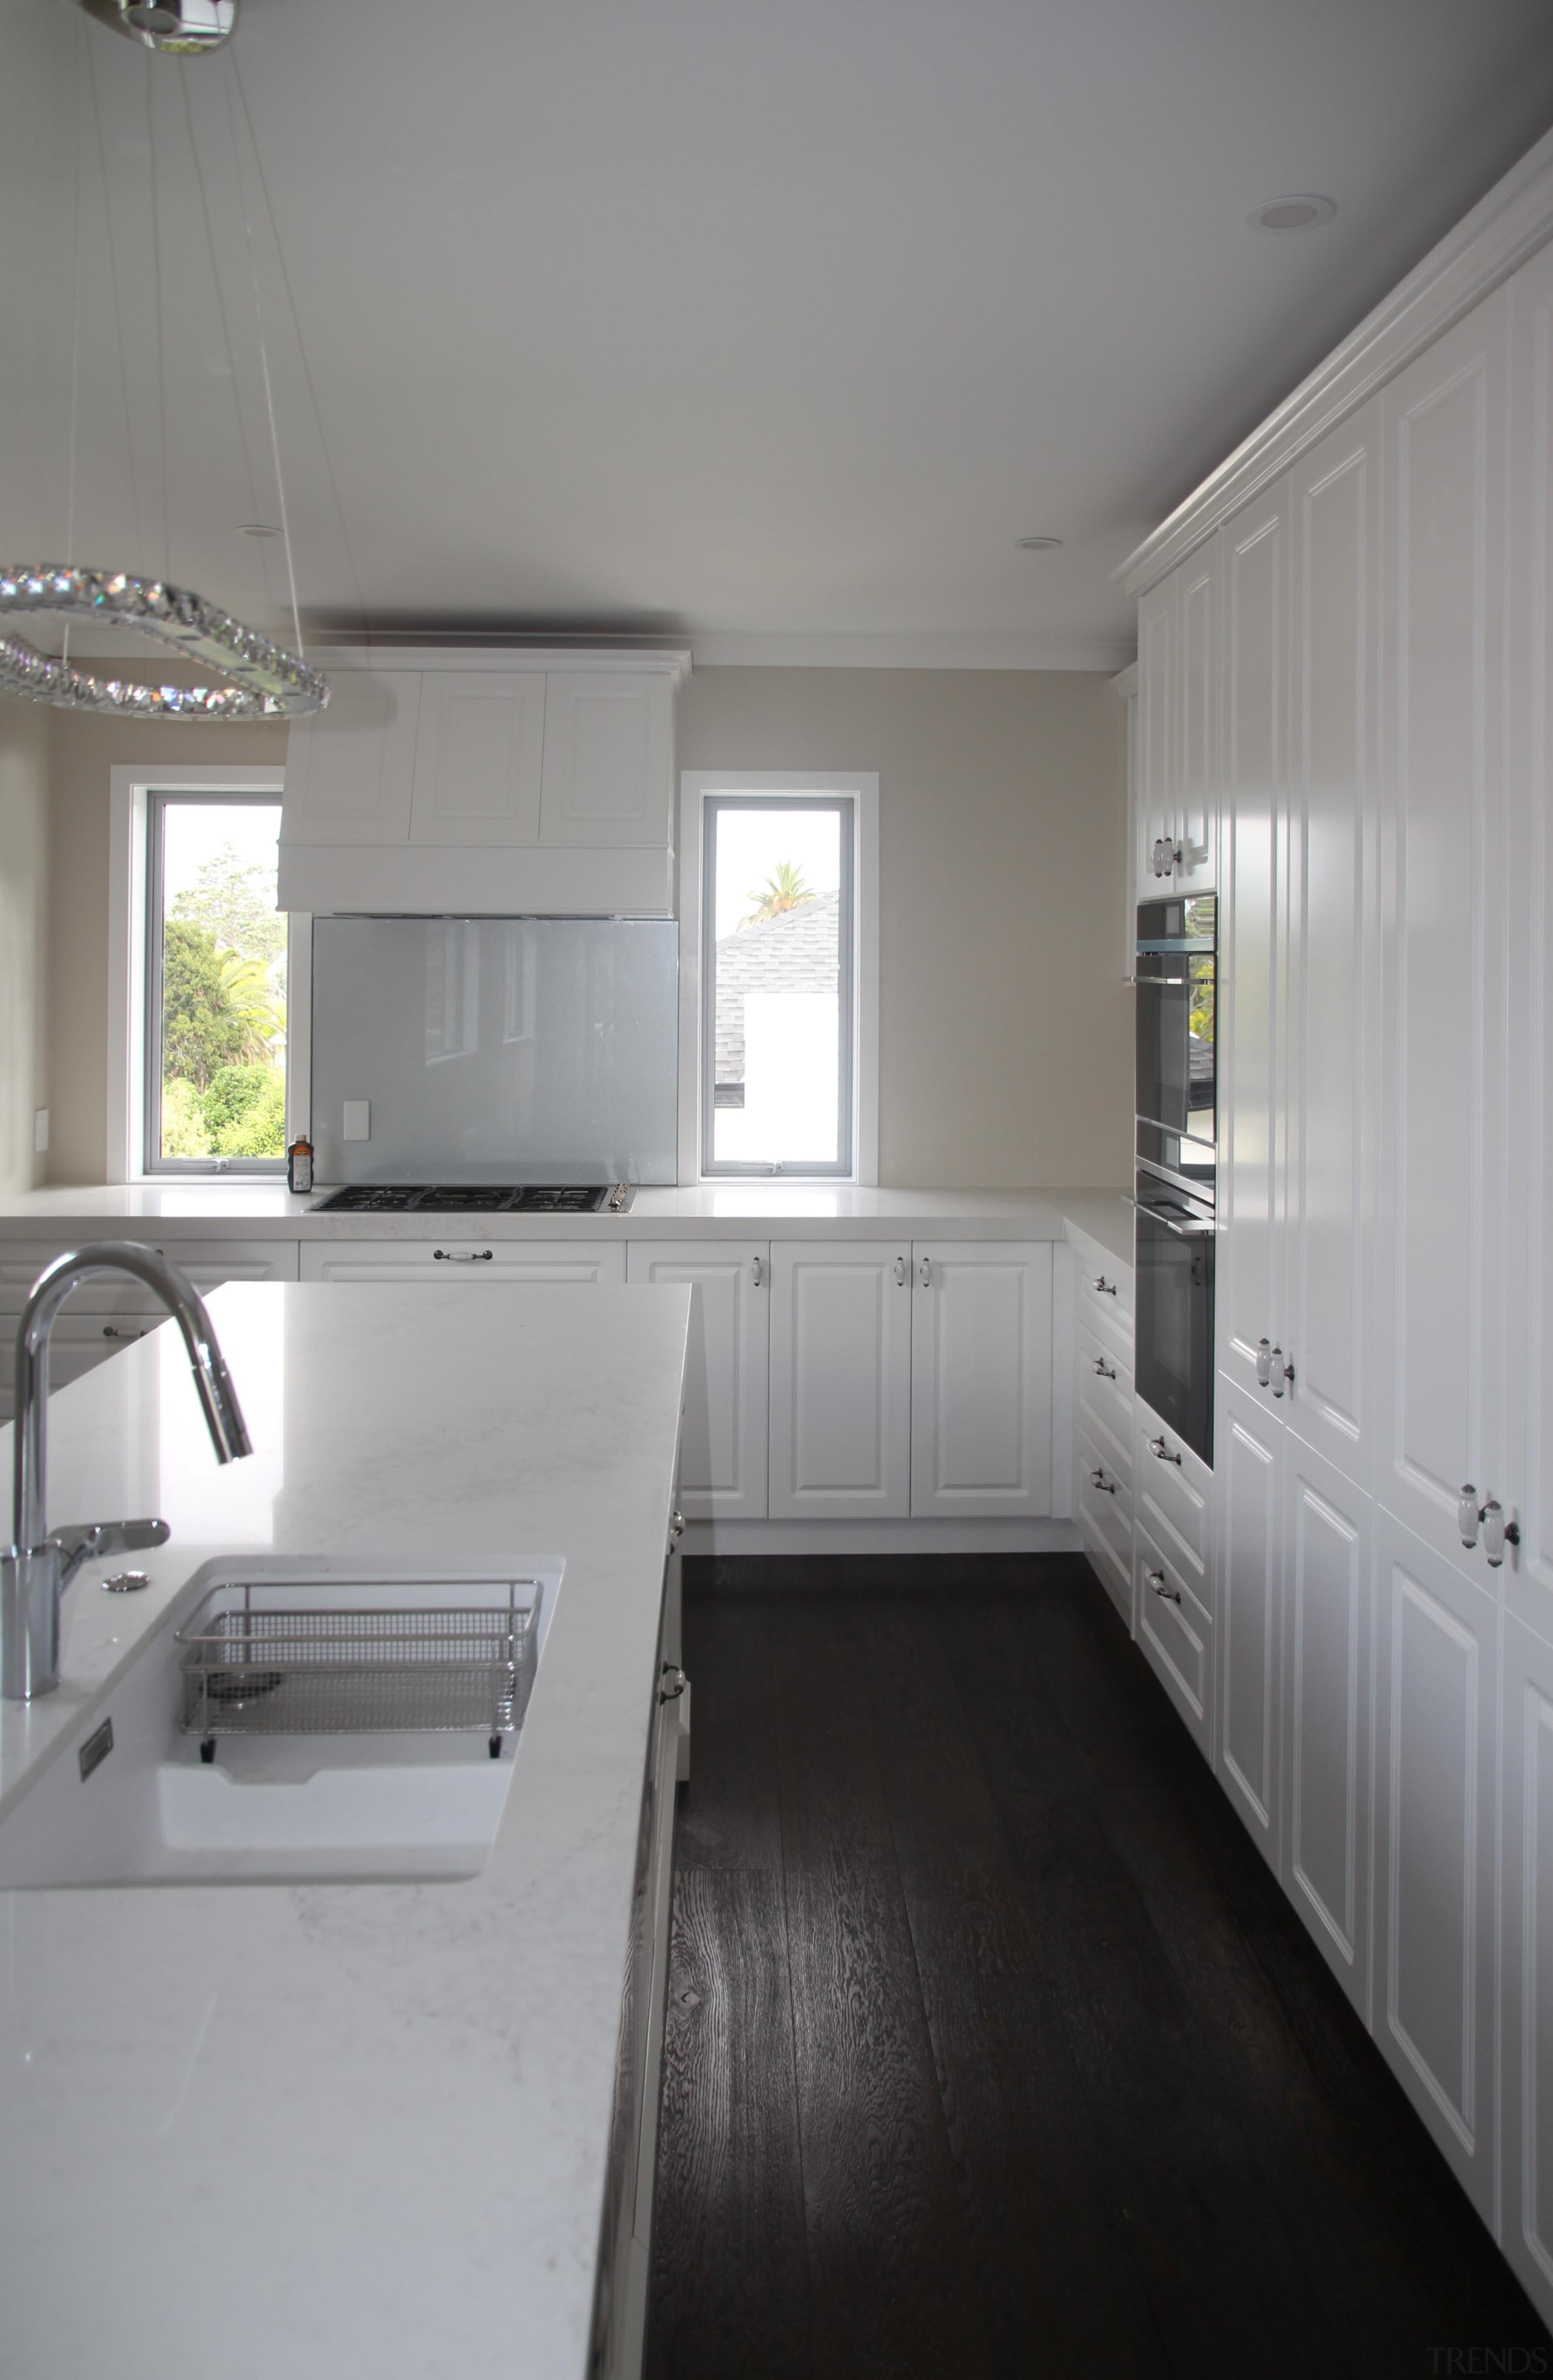 An Italian engineered dark oak floor, in the countertop, daylighting, floor, home, house, interior design, kitchen, real estate, room, gray